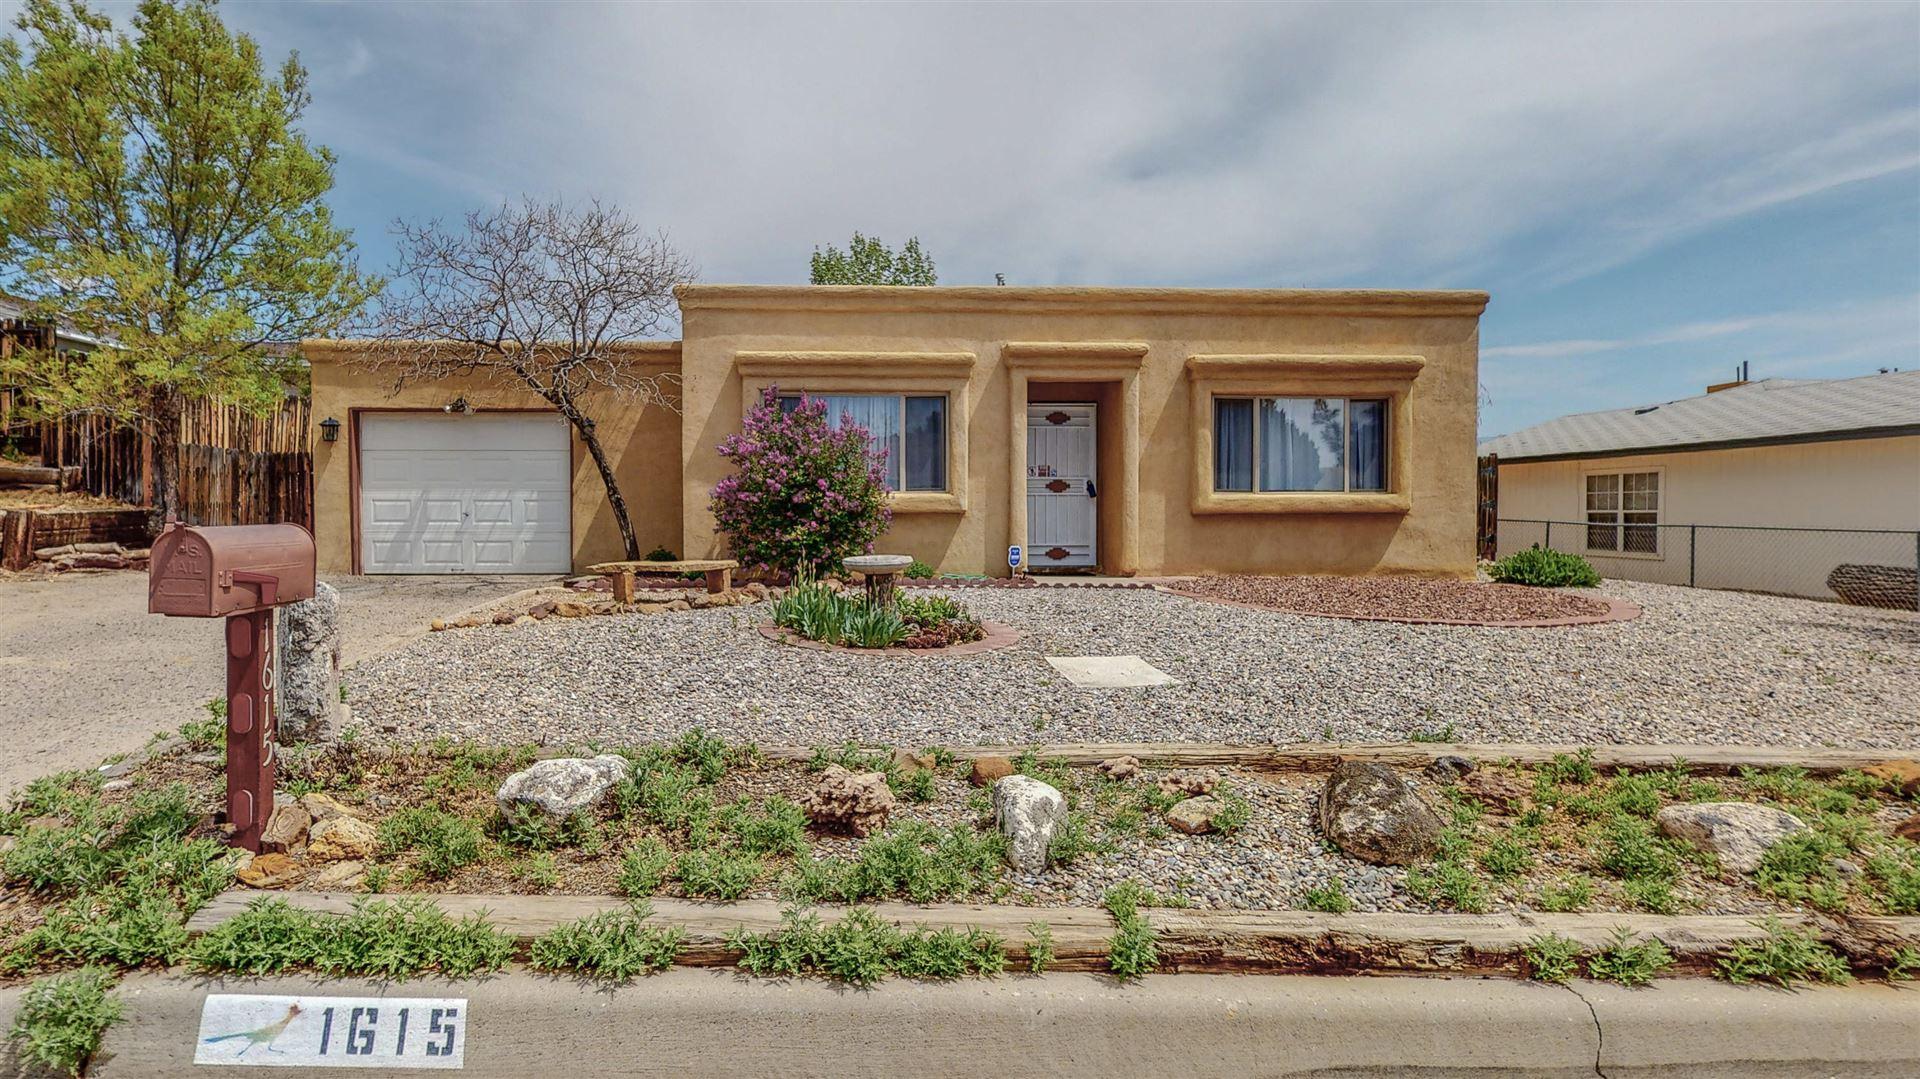 1615 BOREALIS Avenue SE, Rio Rancho, NM 87124 - MLS#: 989655